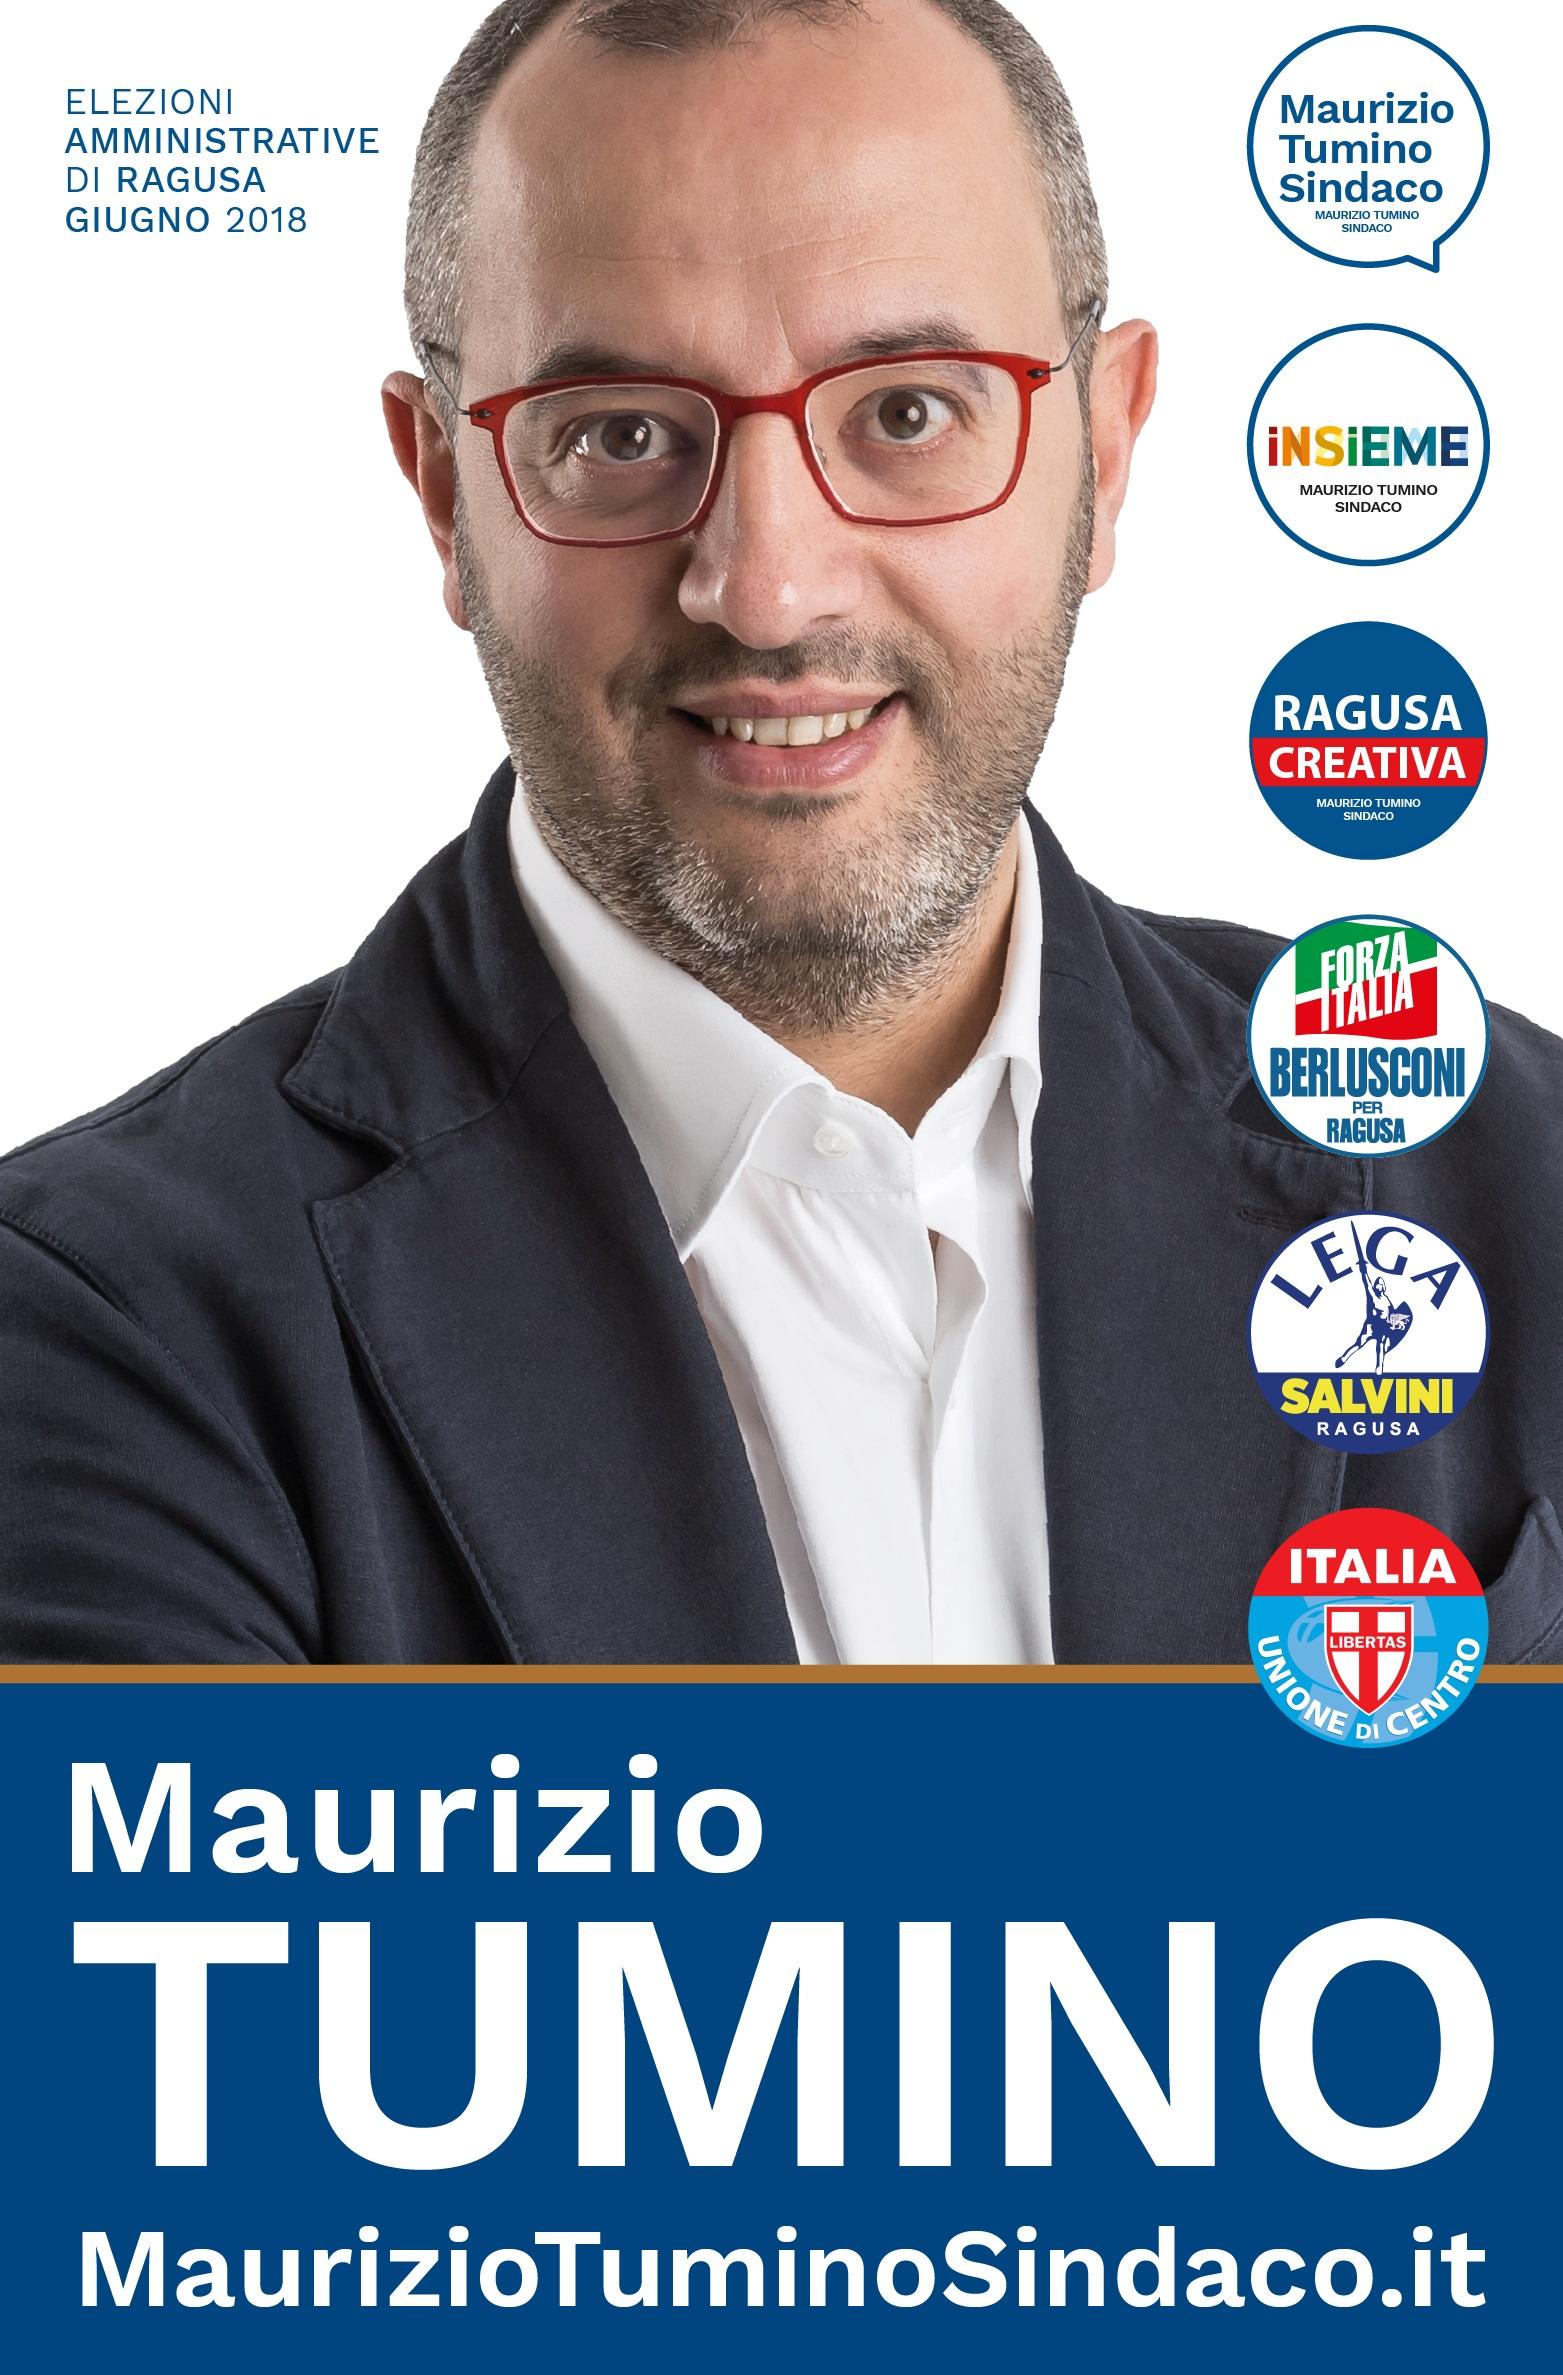 Maurizio Tumino